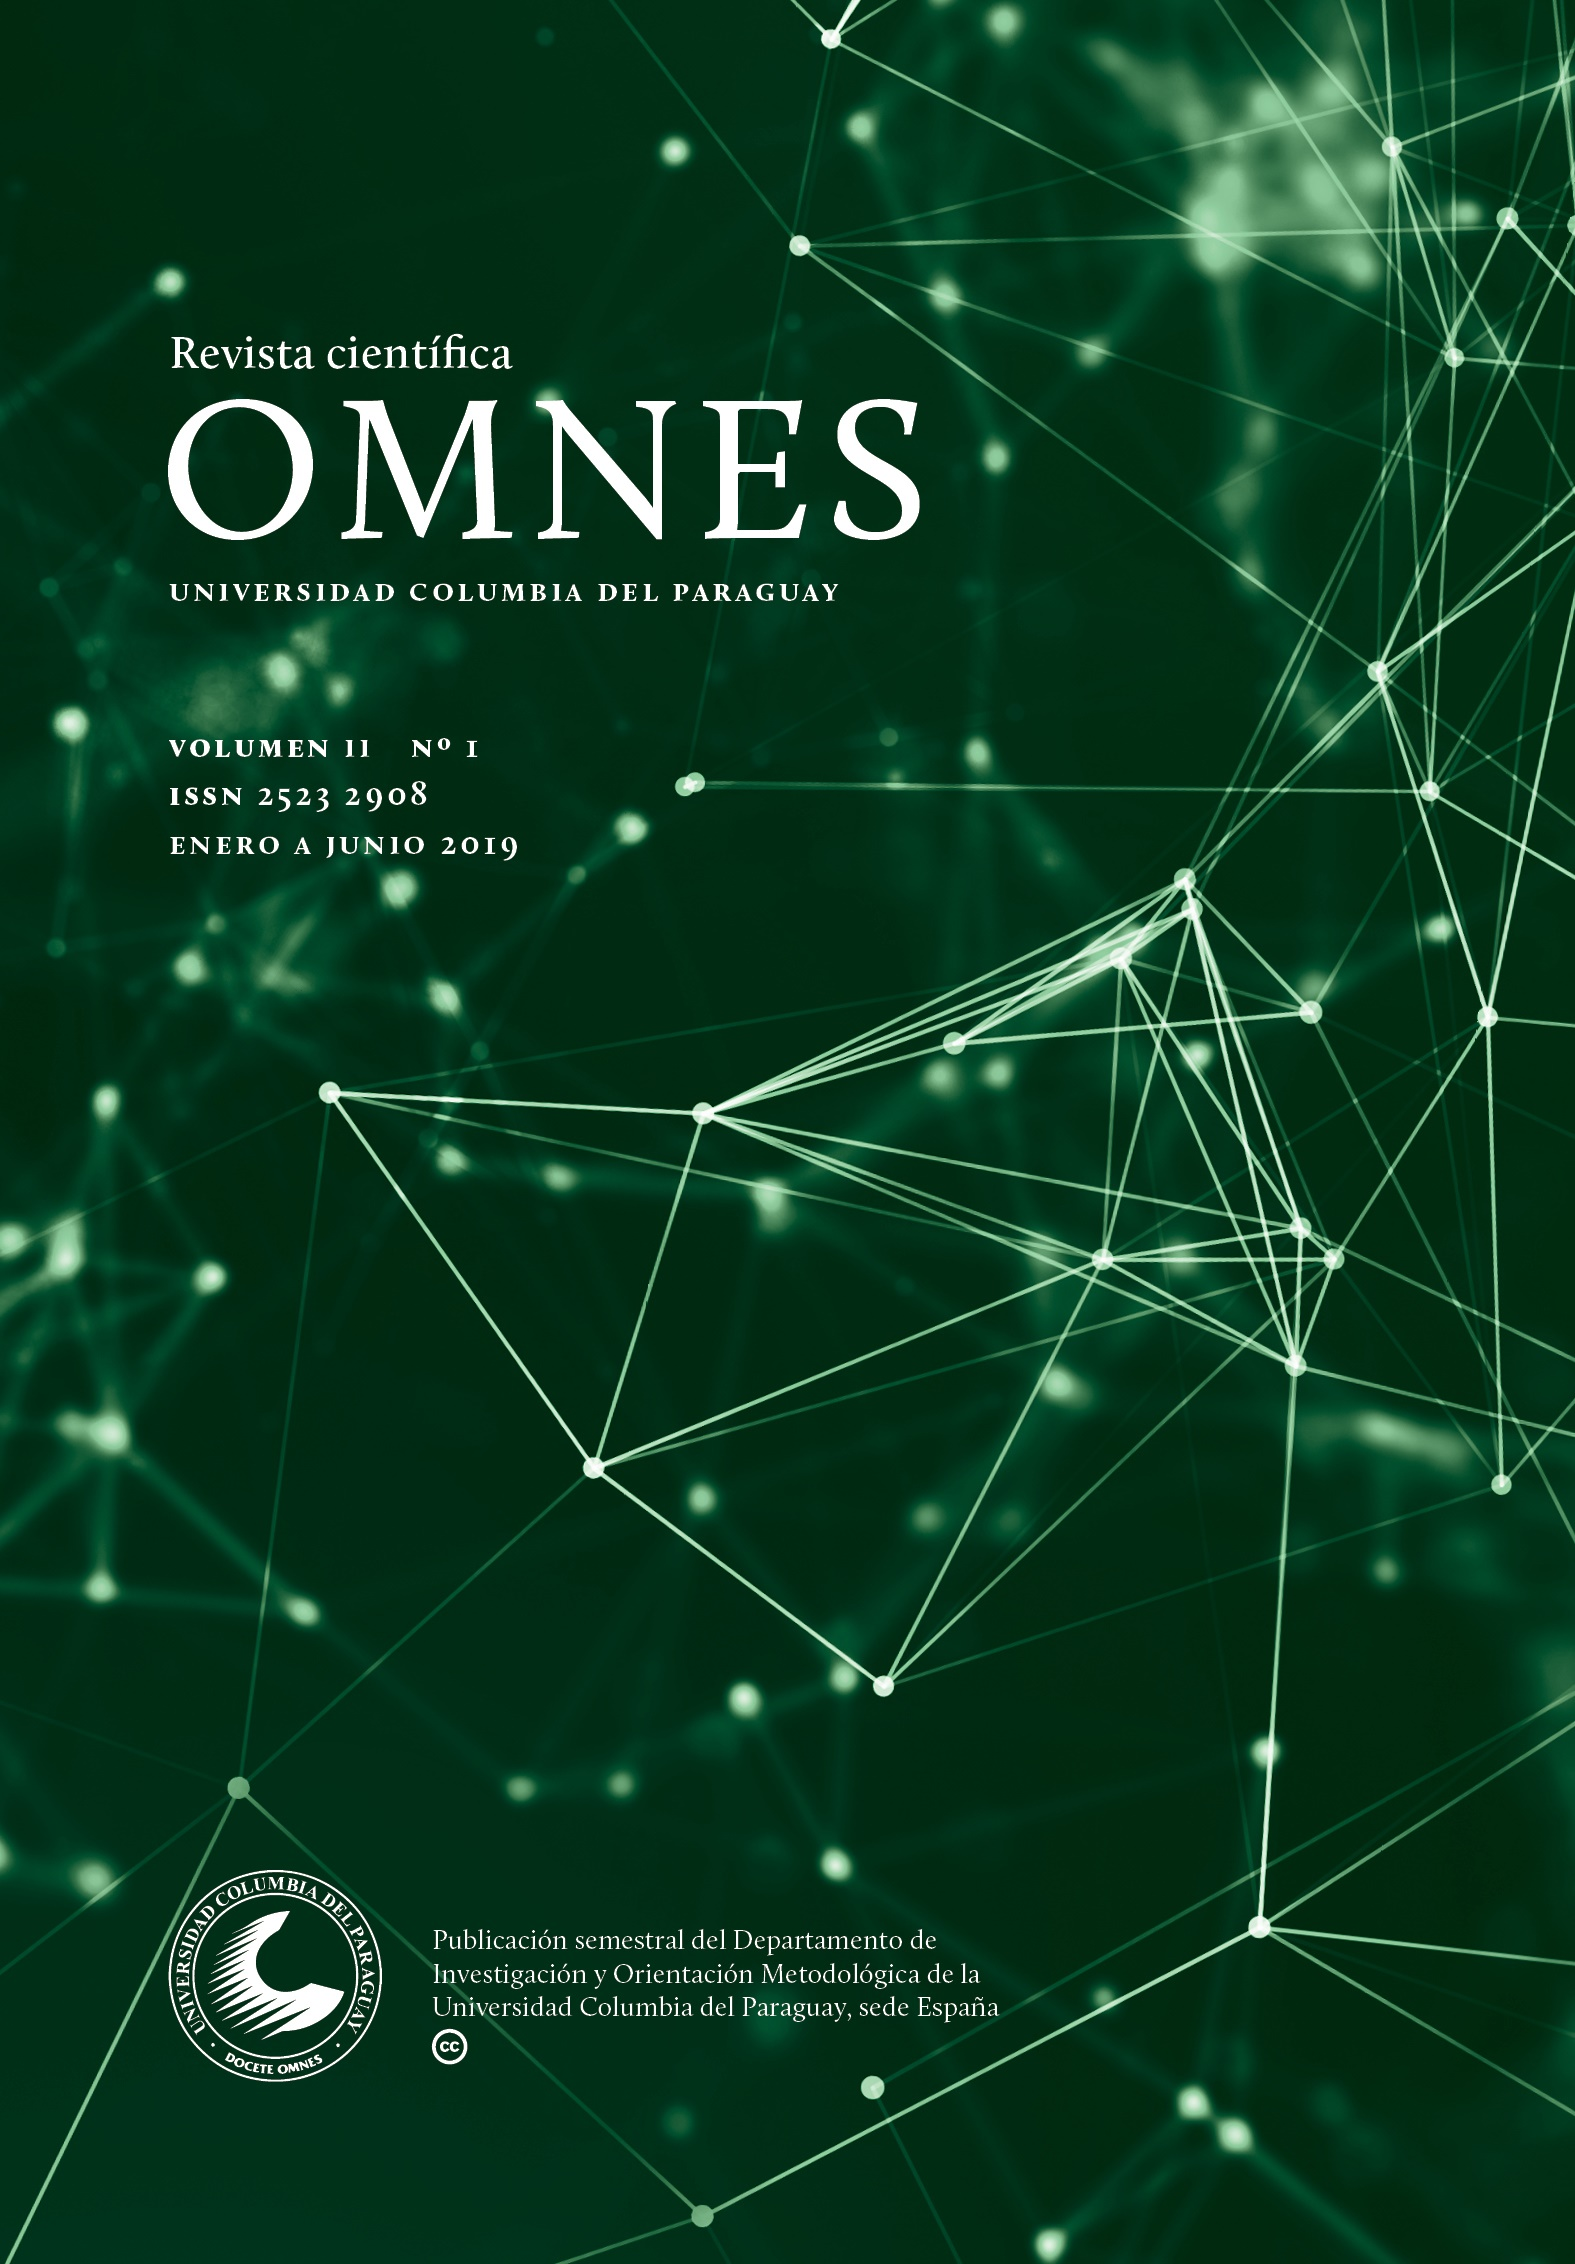 OMNES, Vol. 2 Nro. 1